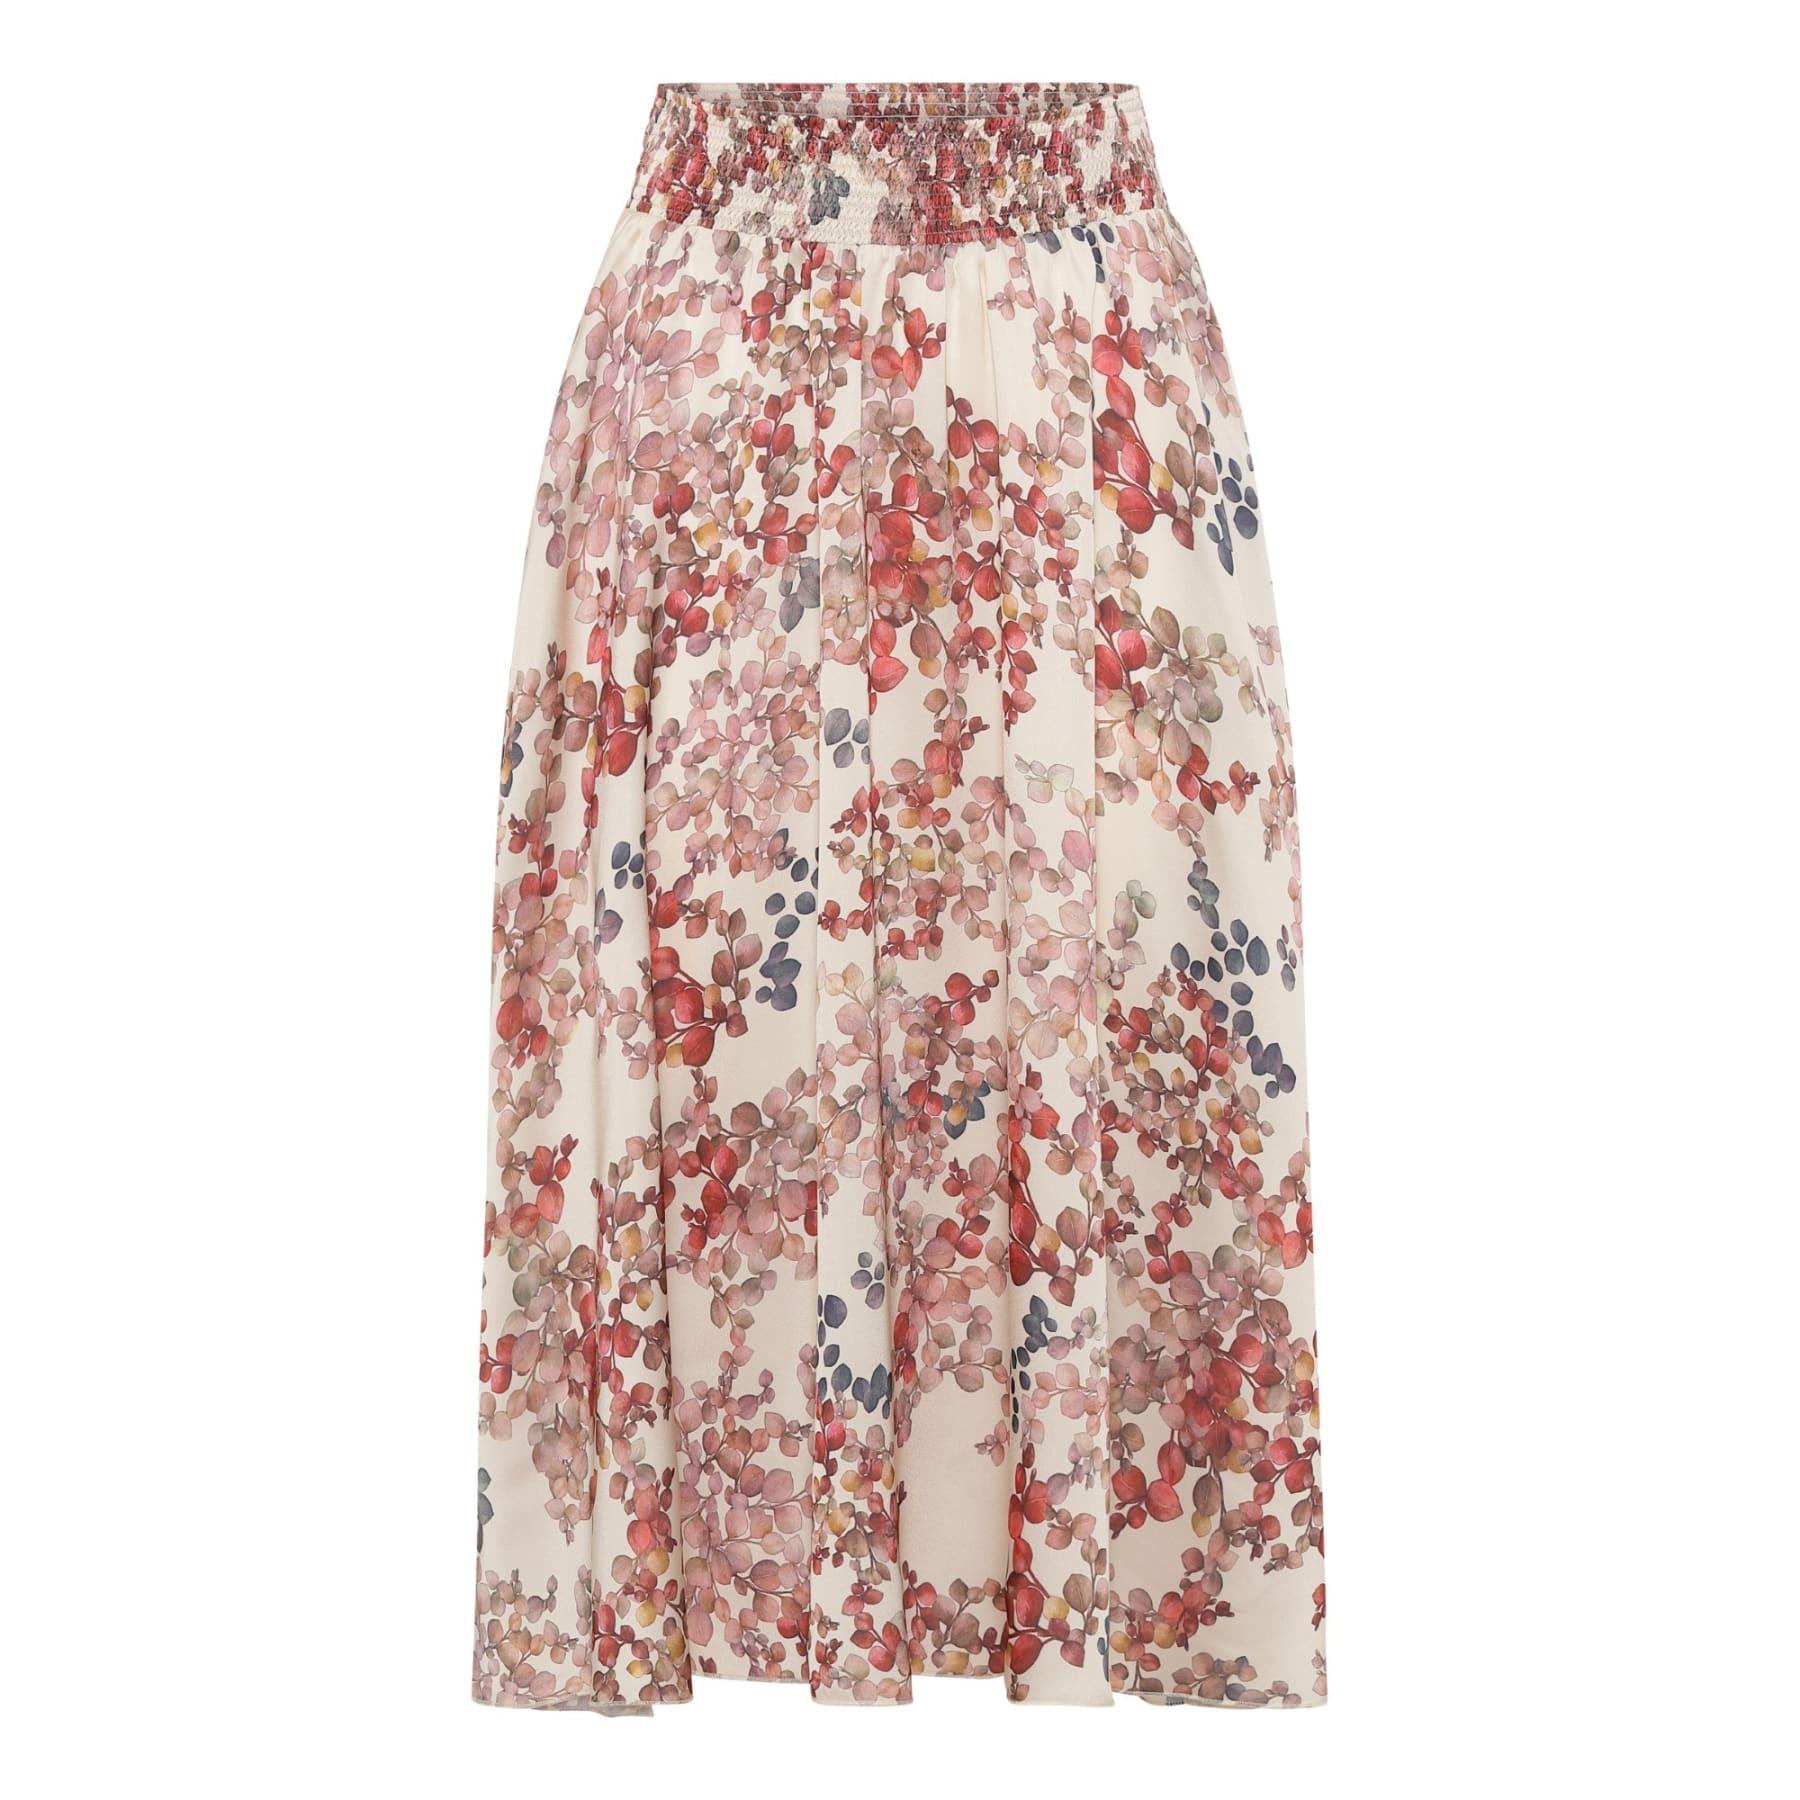 Trini Skirt - Melange Ivory IMAGE BY ME